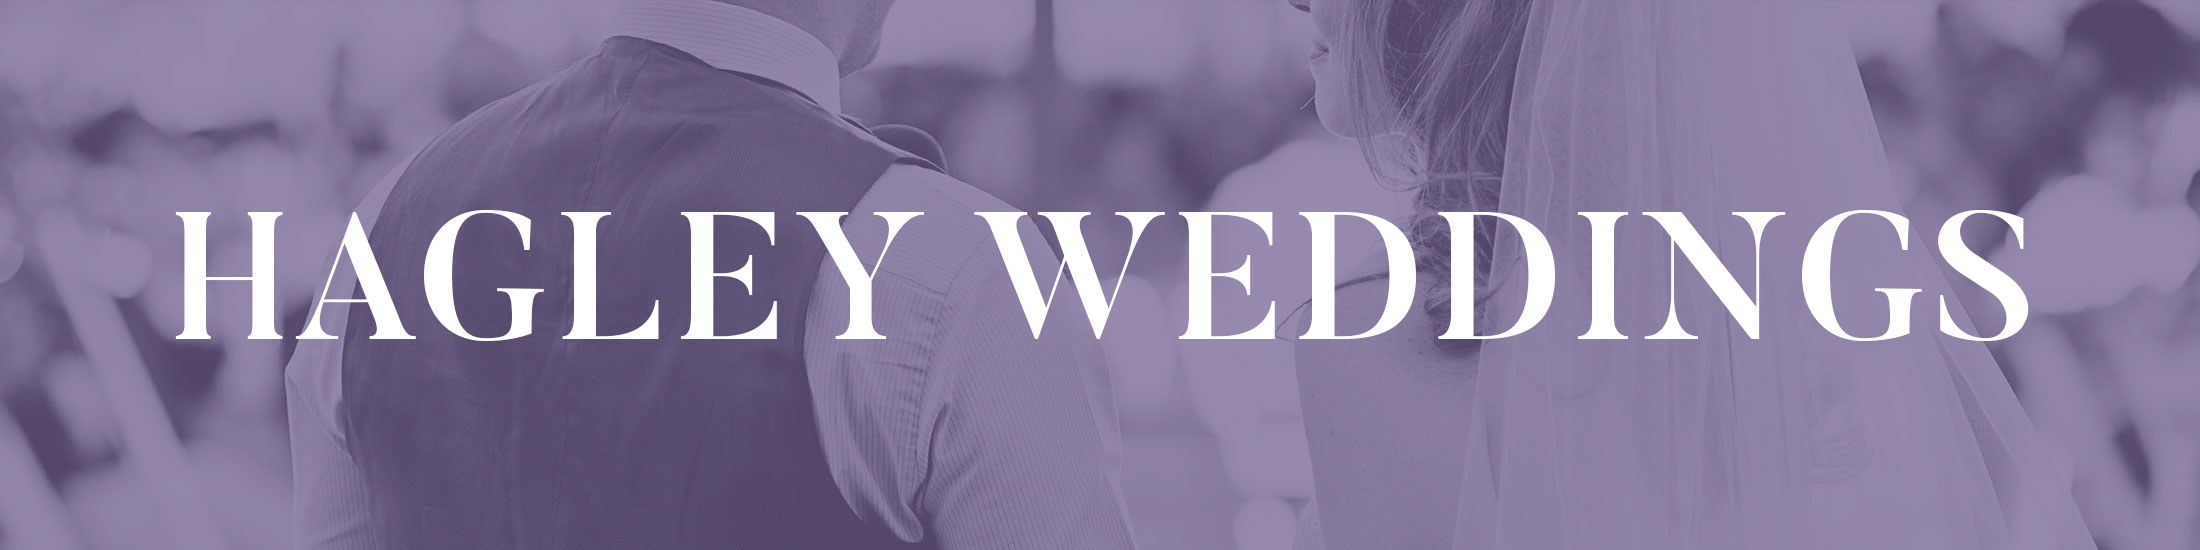 Hagley Weddings